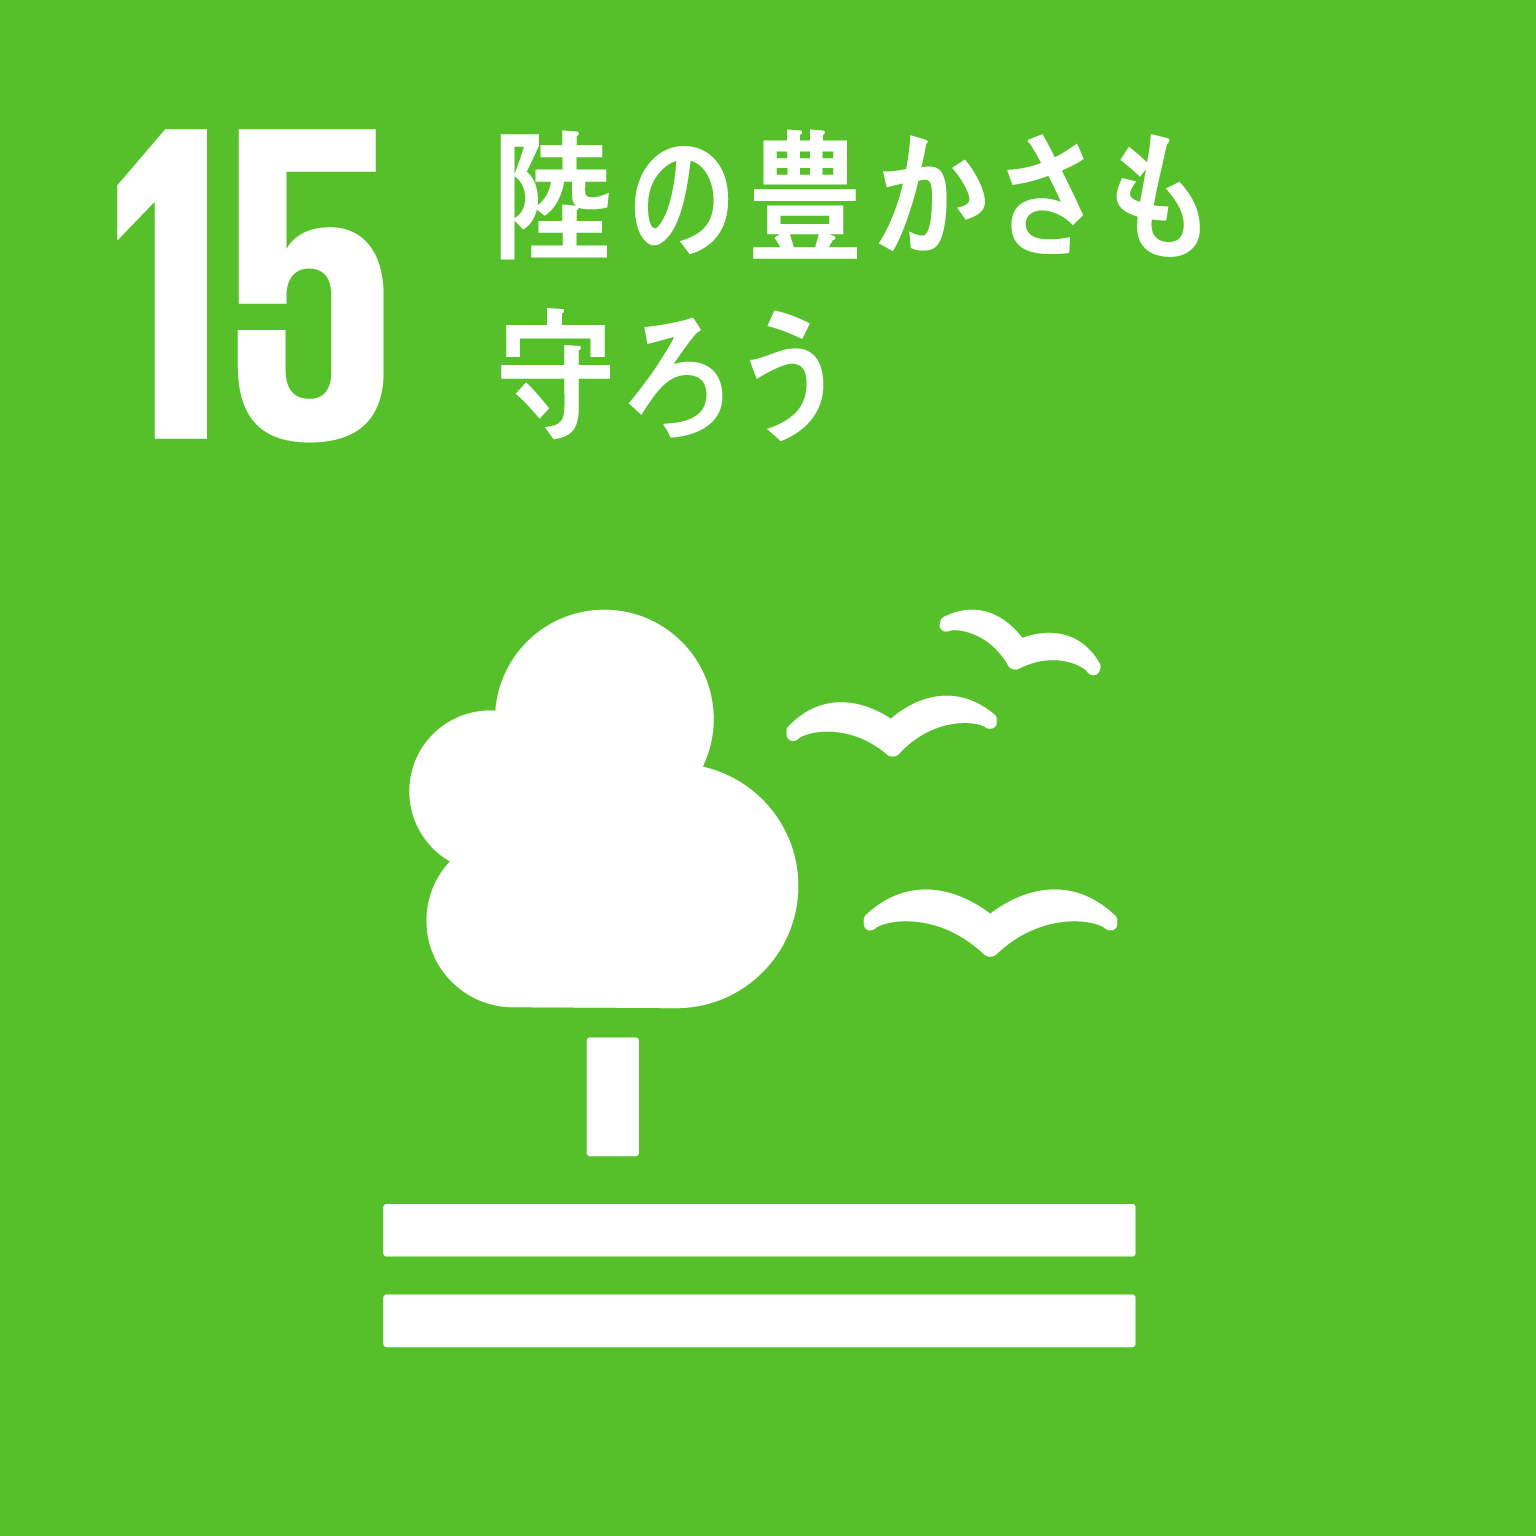 SDGsの第15目標 陸の豊かさを守ろう